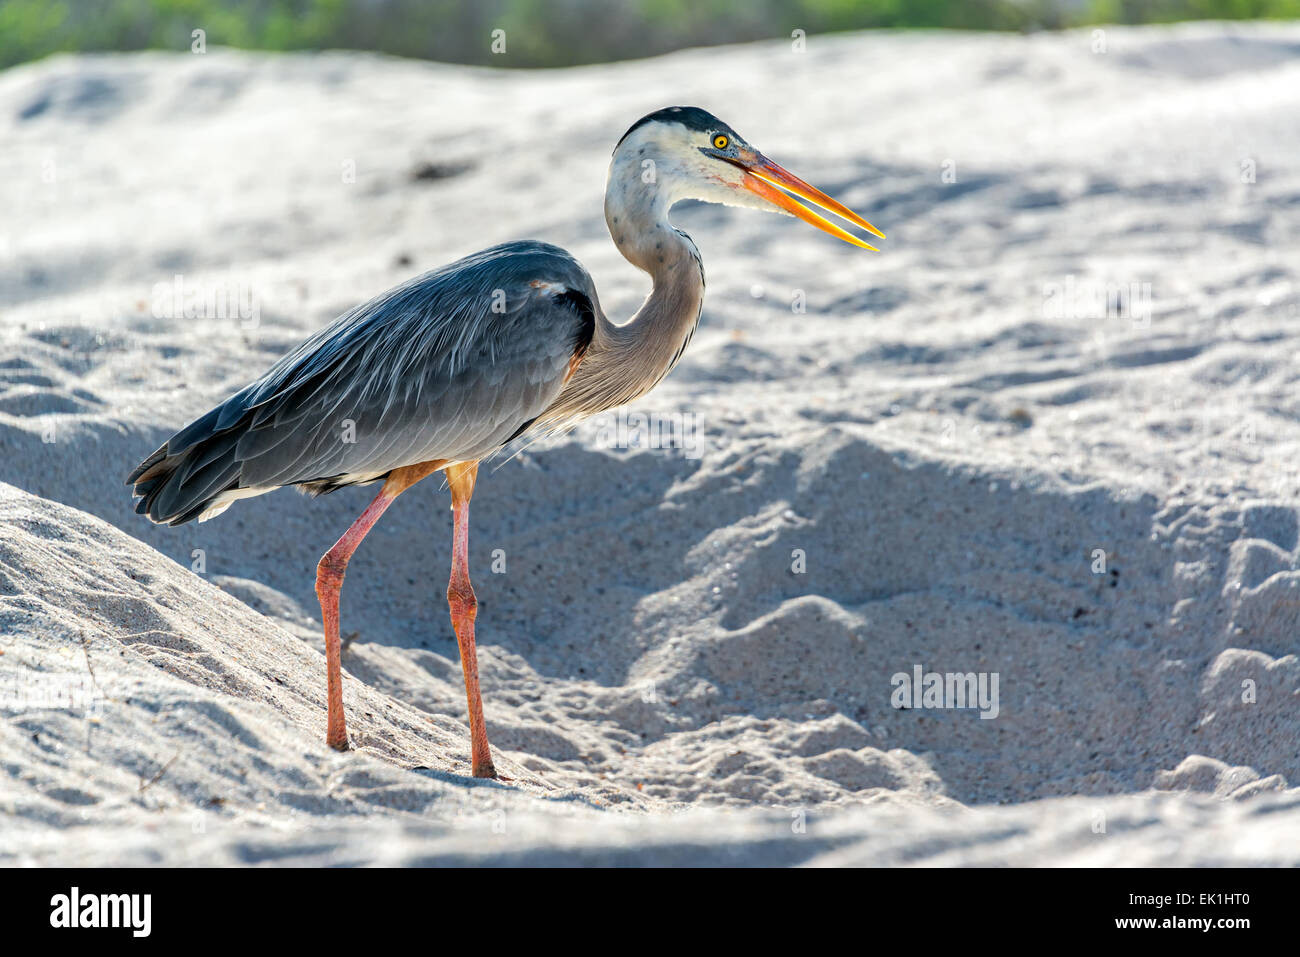 Great Blue Heron on a beach on Santa Cruz in the Galapagos Islands - Stock Image